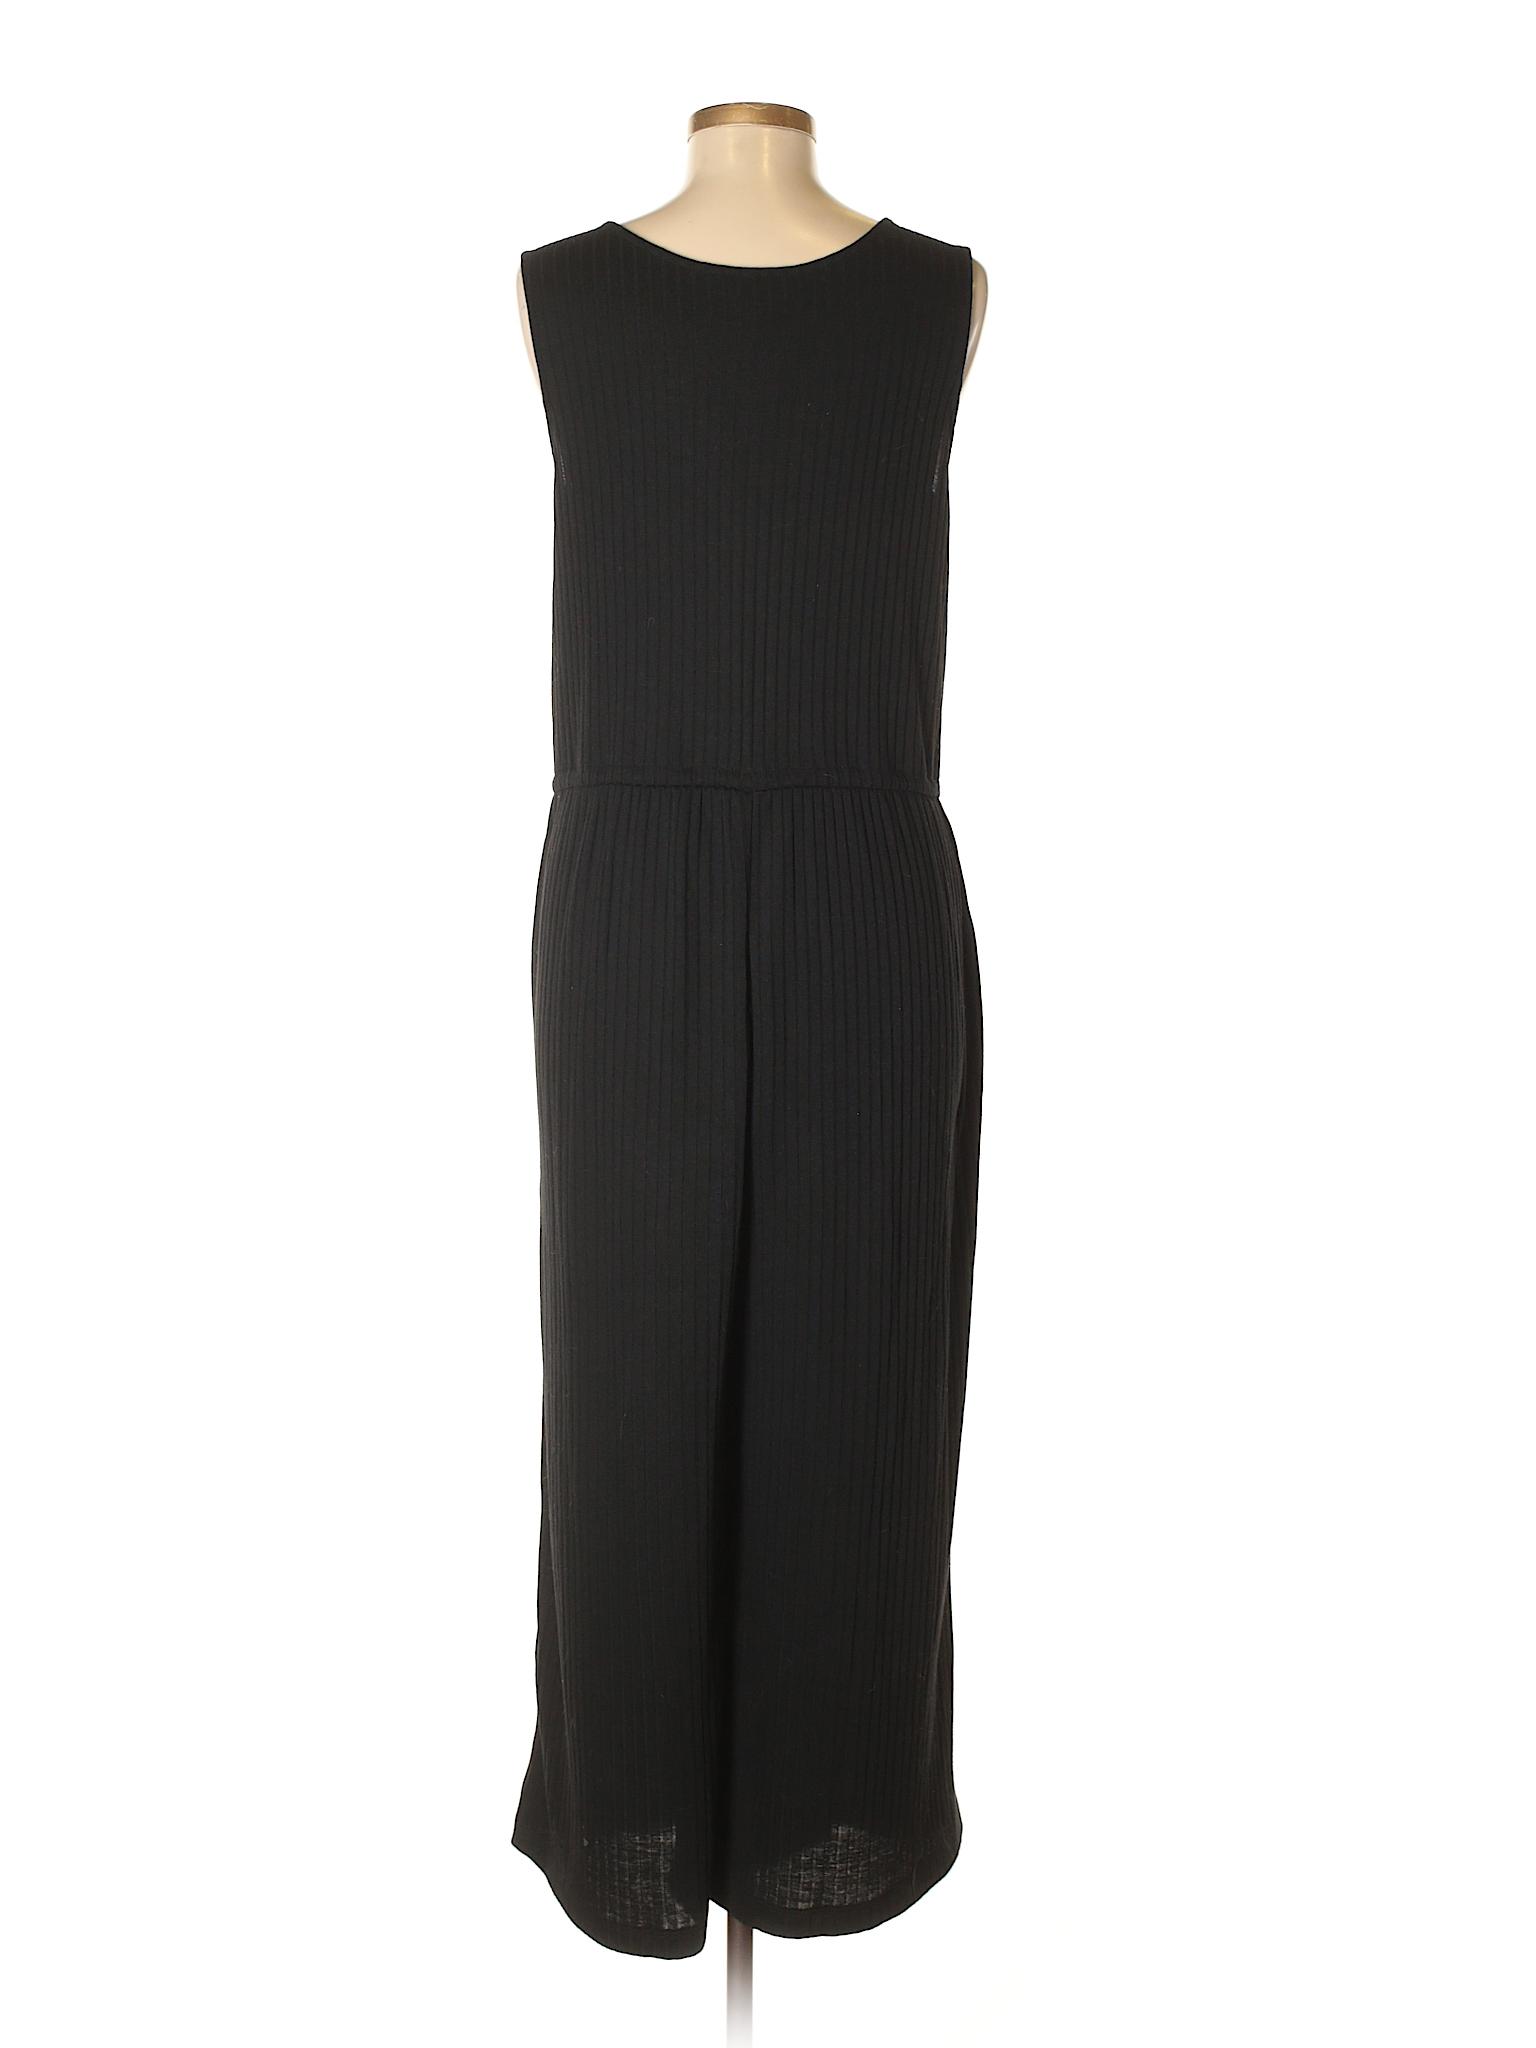 Uniqlo jumpsuit size black womenus dresses uniqlo